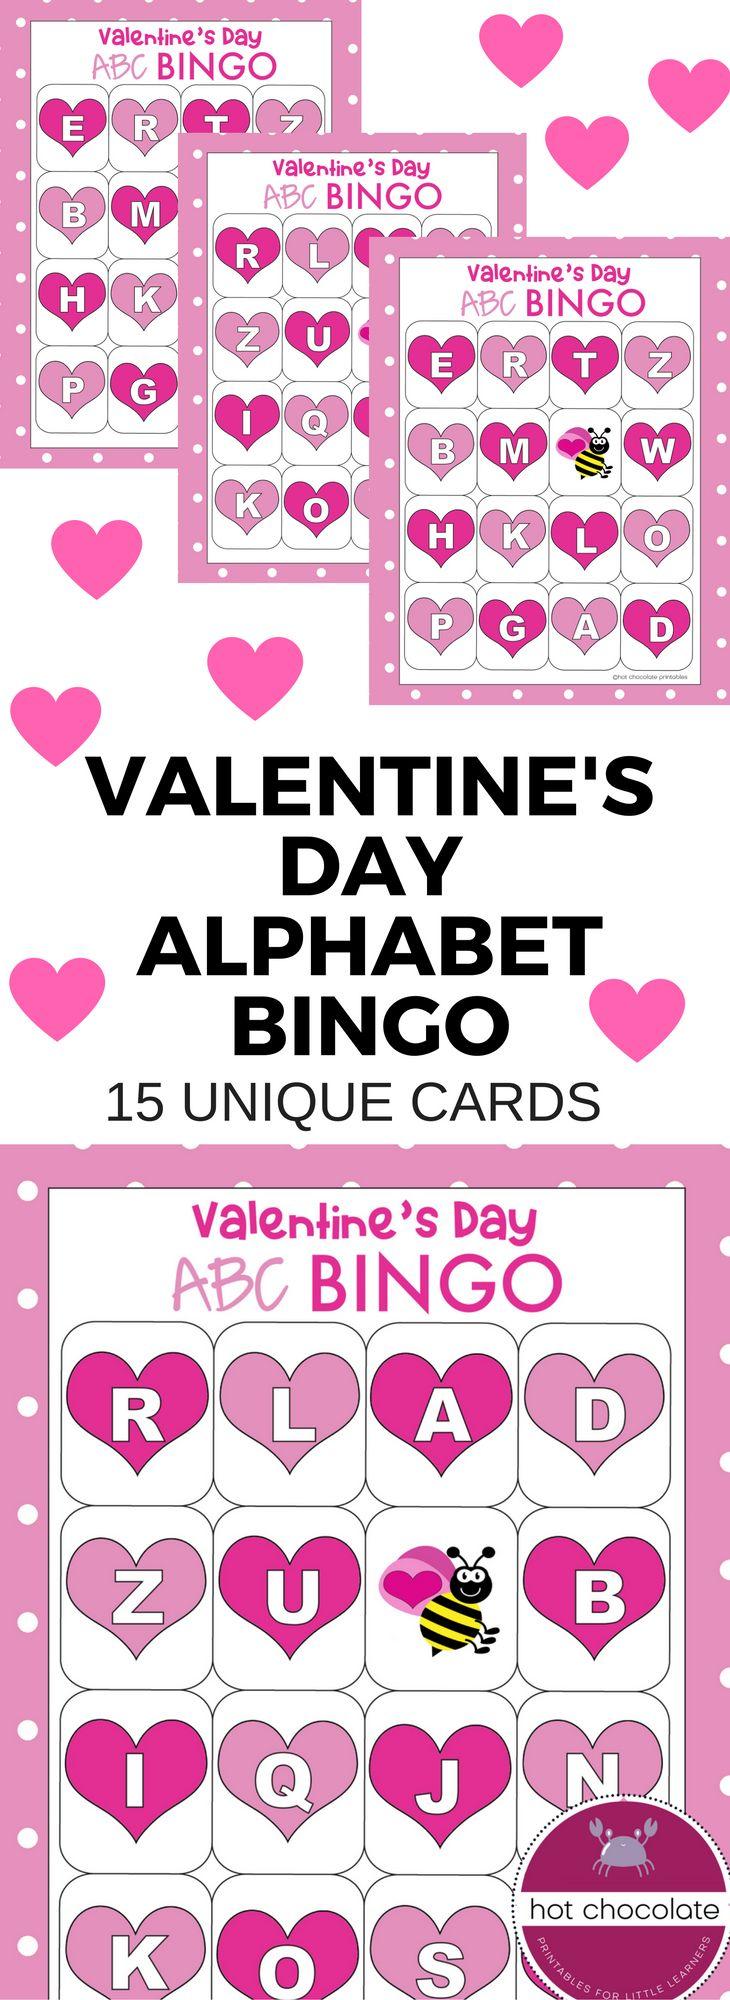 Best 25 Alphabet bingo ideas on Pinterest  Abc bingo Letter